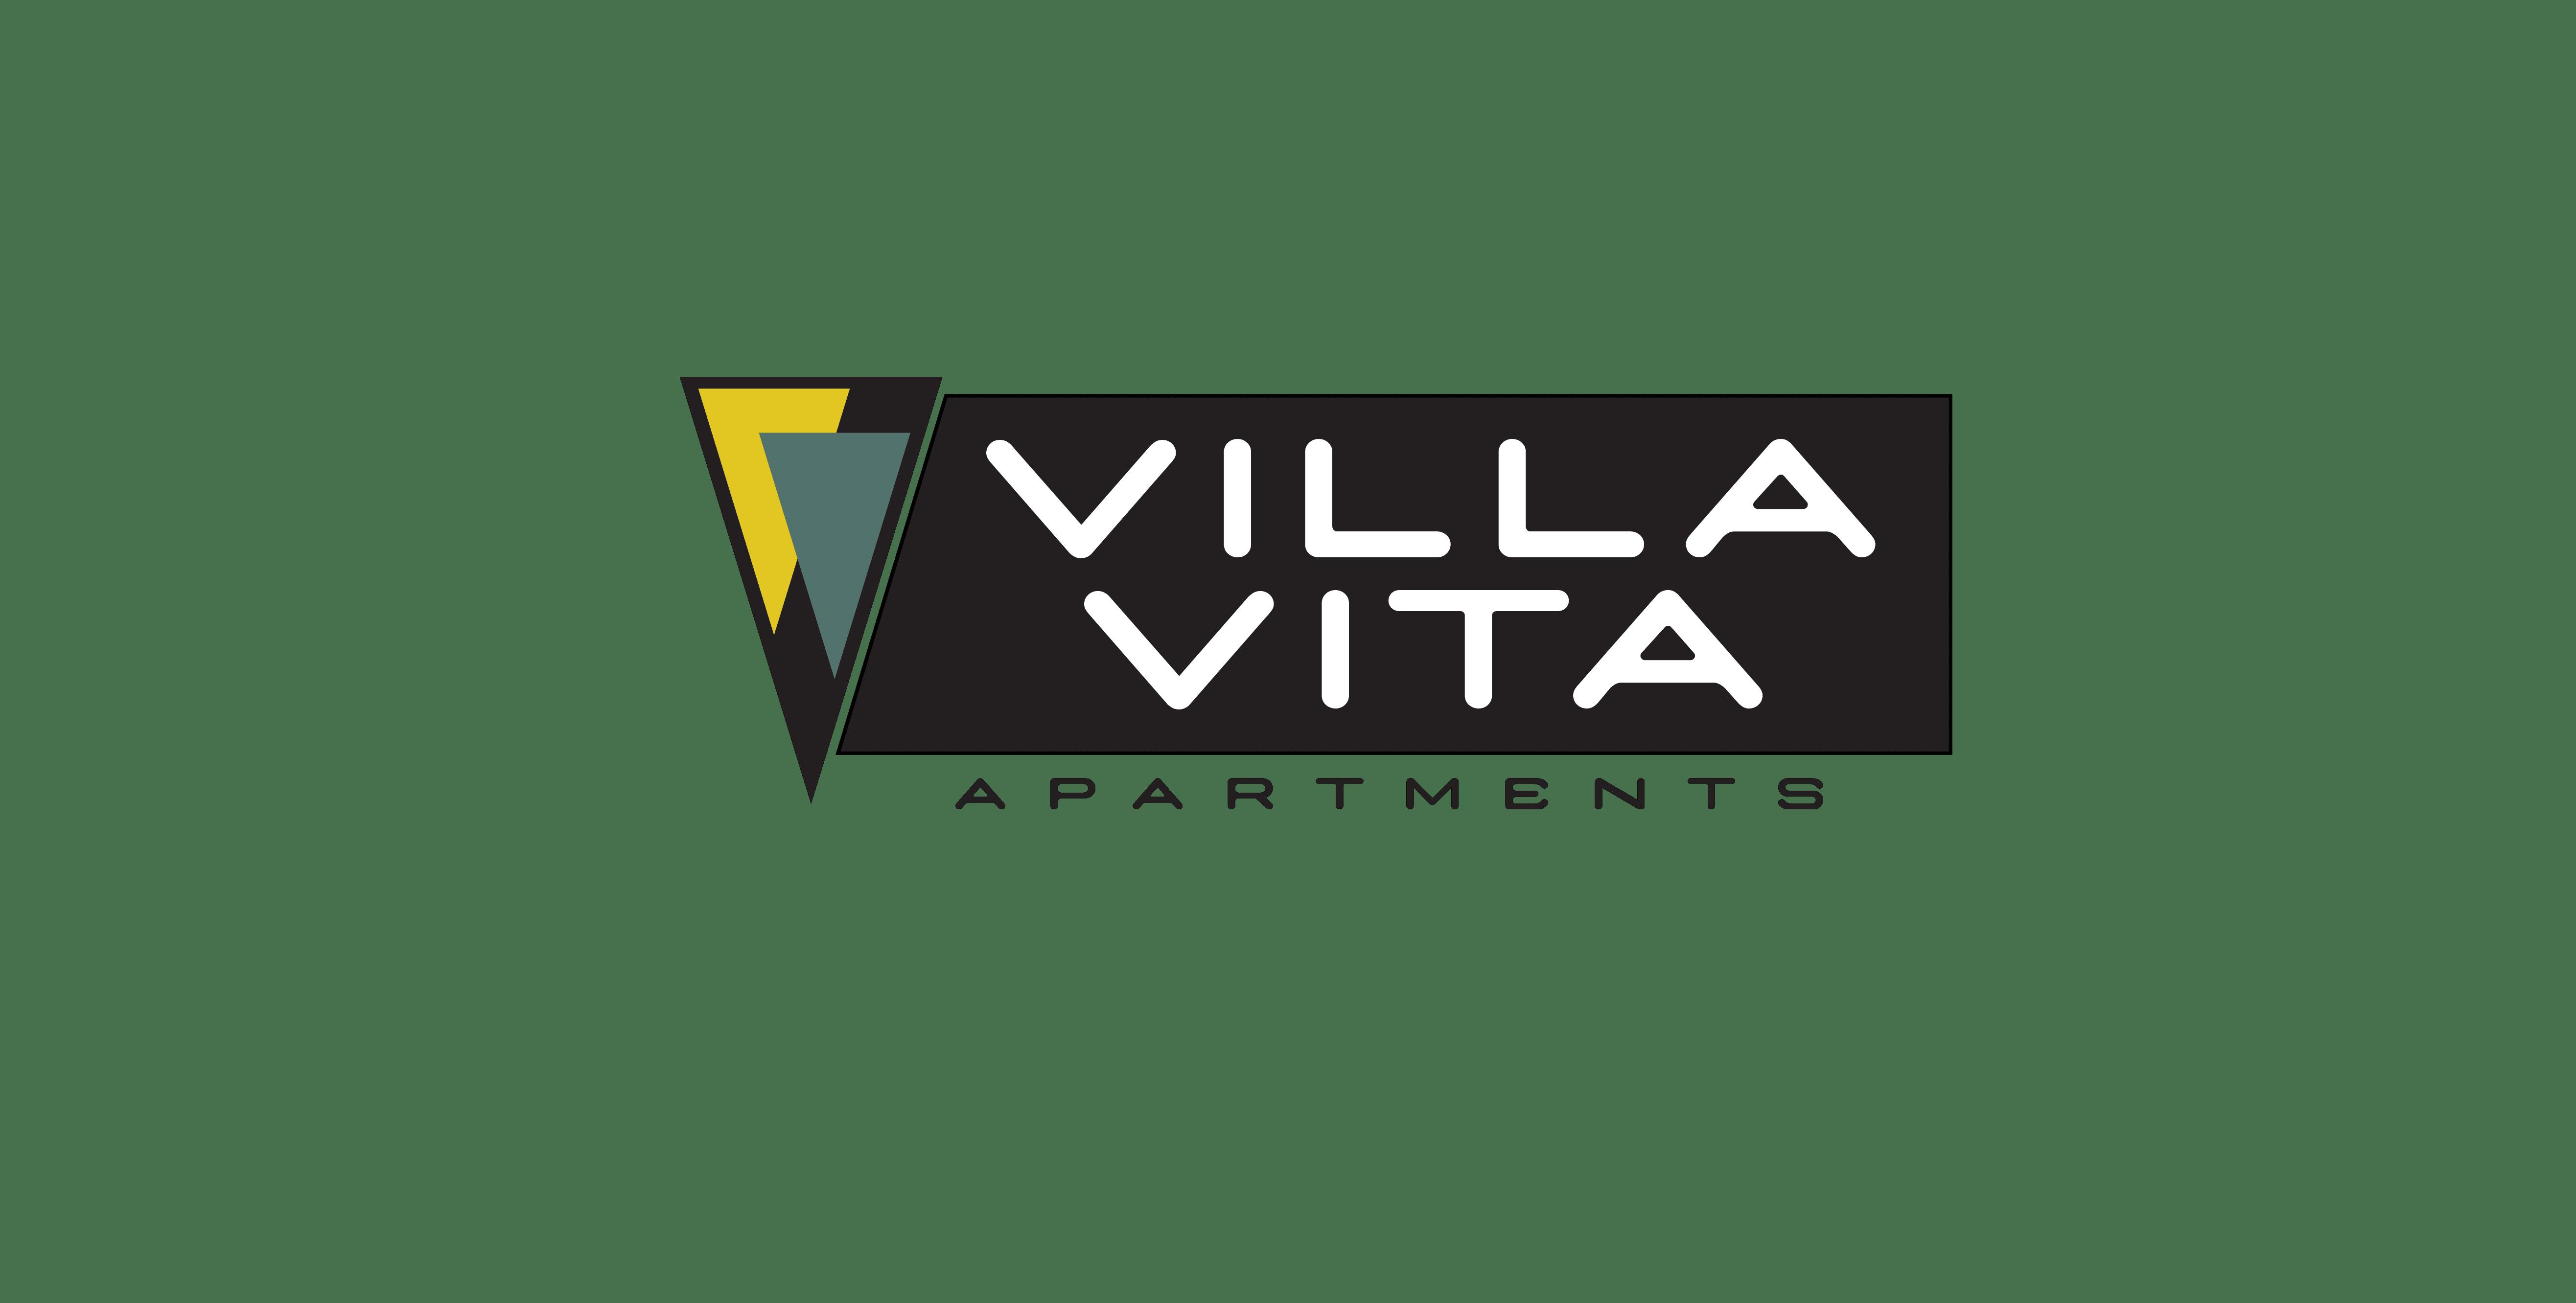 Villa Vita property logo